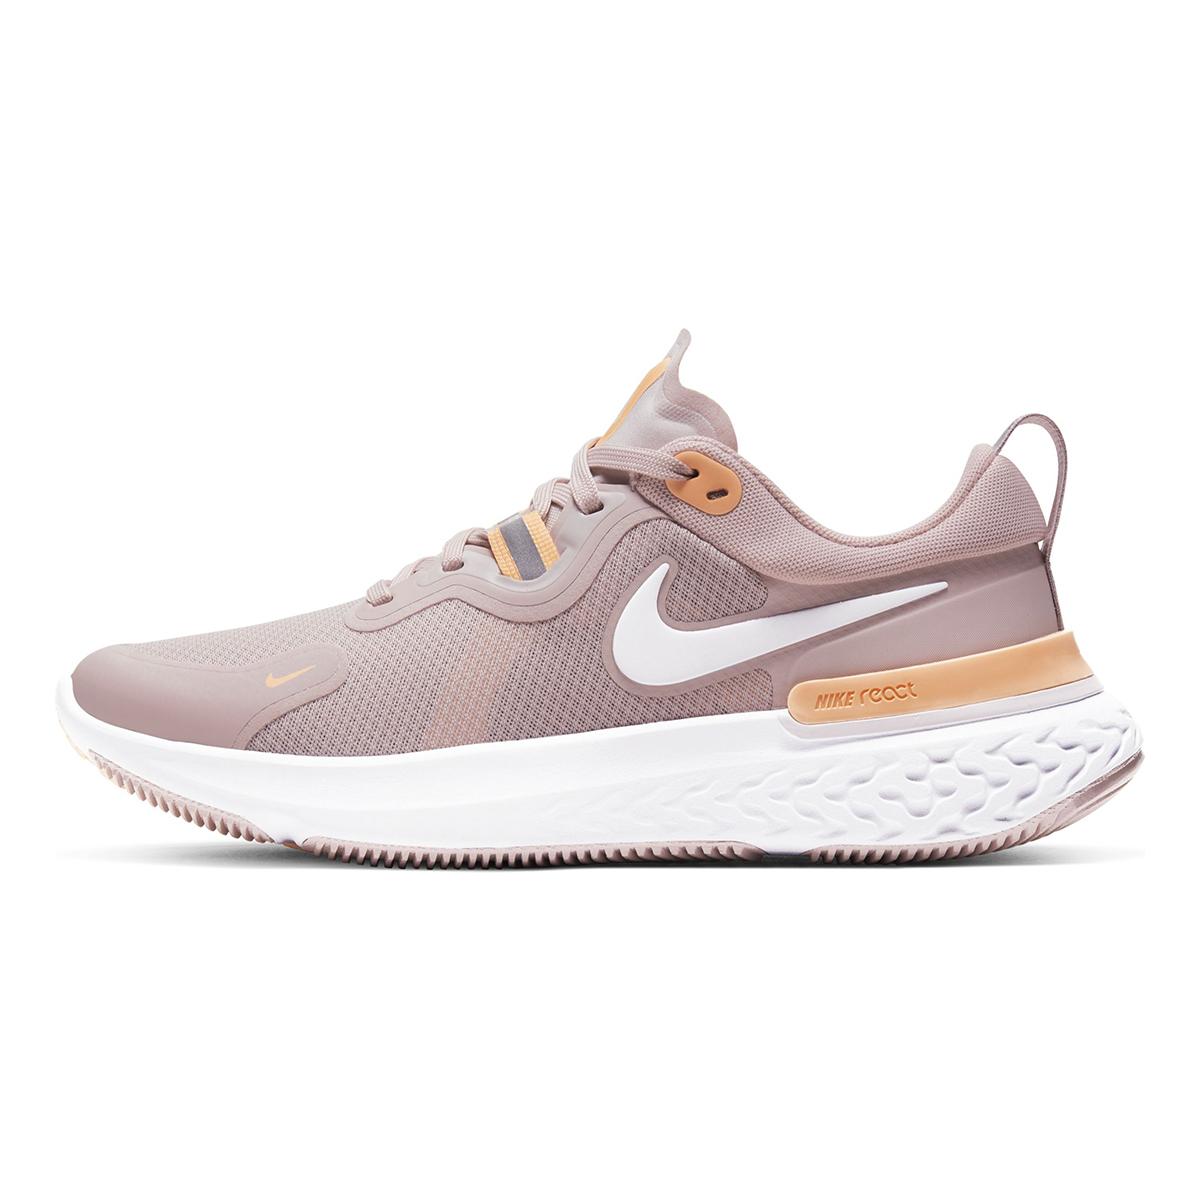 Women's Nike React Miler Running Shoe - Color: Champagne/Orange Pulse/Barely Rose/White (Regular Width) - Size: 5, Champagne/Orange Pulse/Barely Rose/White, large, image 2